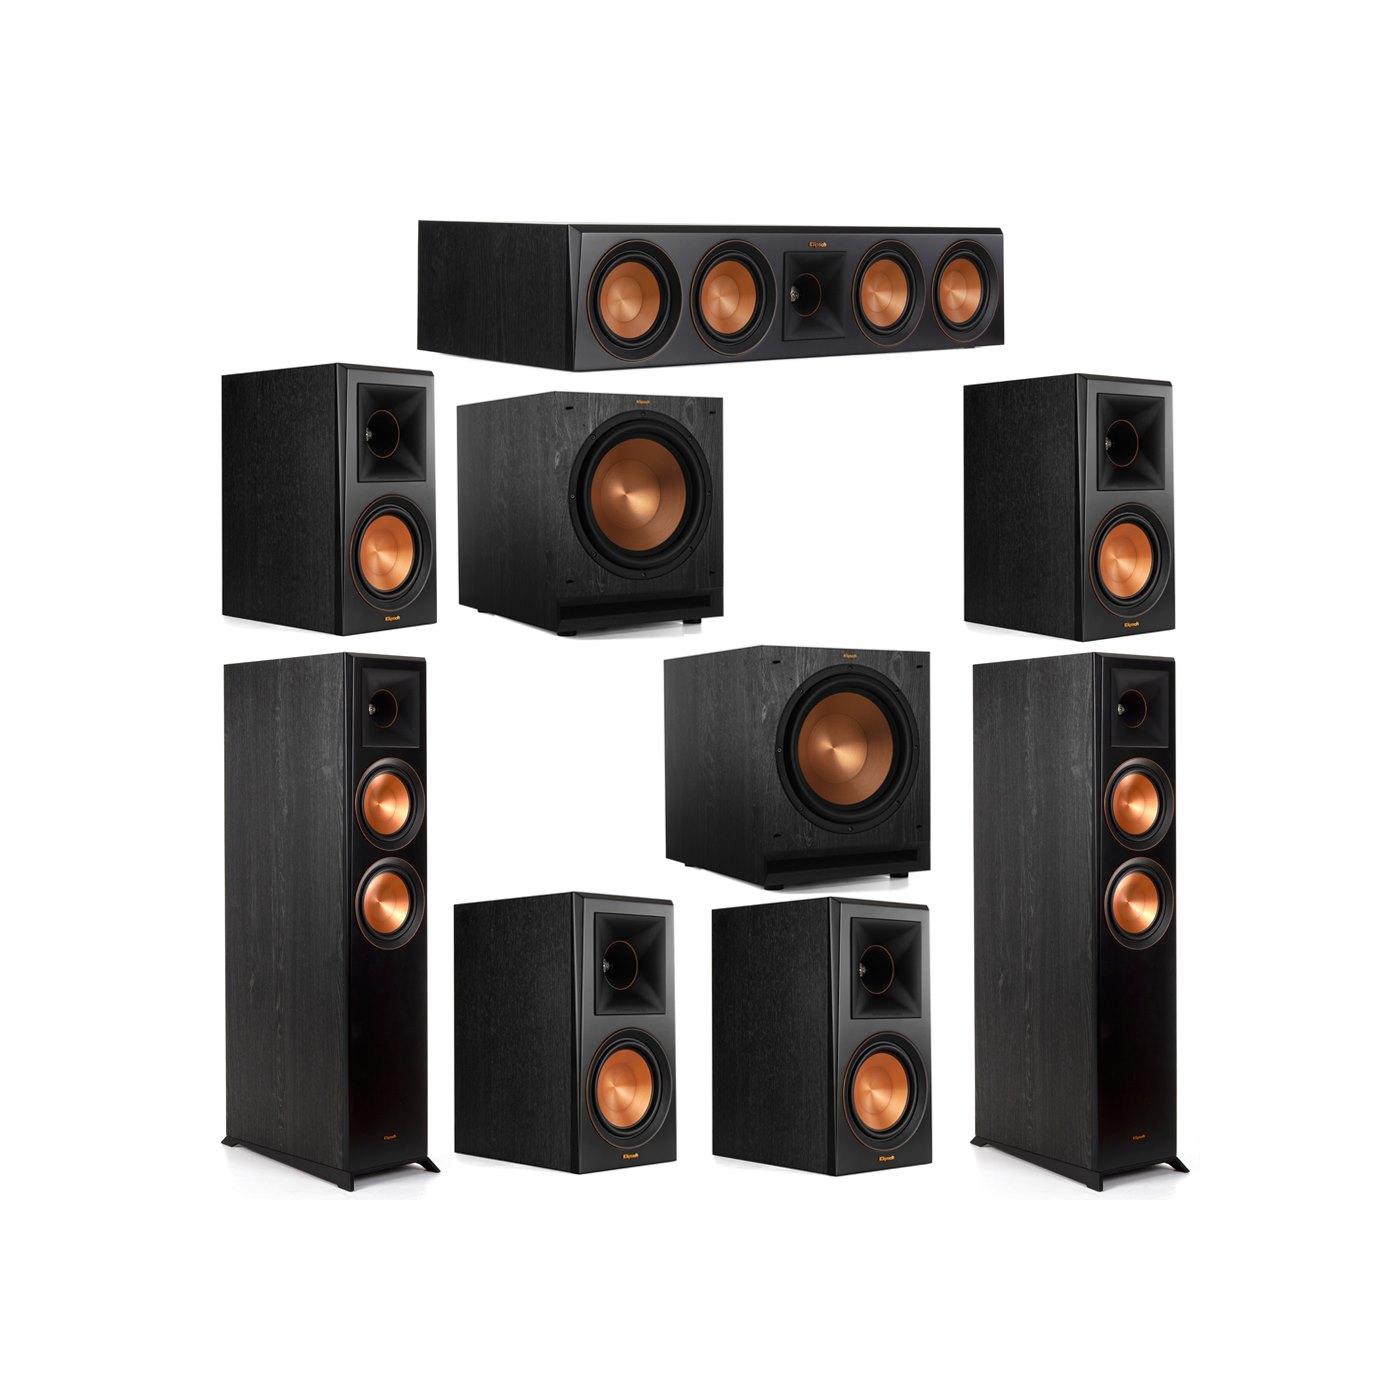 Klipsch 7.2 System with 2 RP-6000F Floorstanding Speakers, 1 Klipsch RP-504C Center Speaker, 4 Klipsch RP-600M Surround Speakers, 2 Klipsch SPL-120 Subwoofers